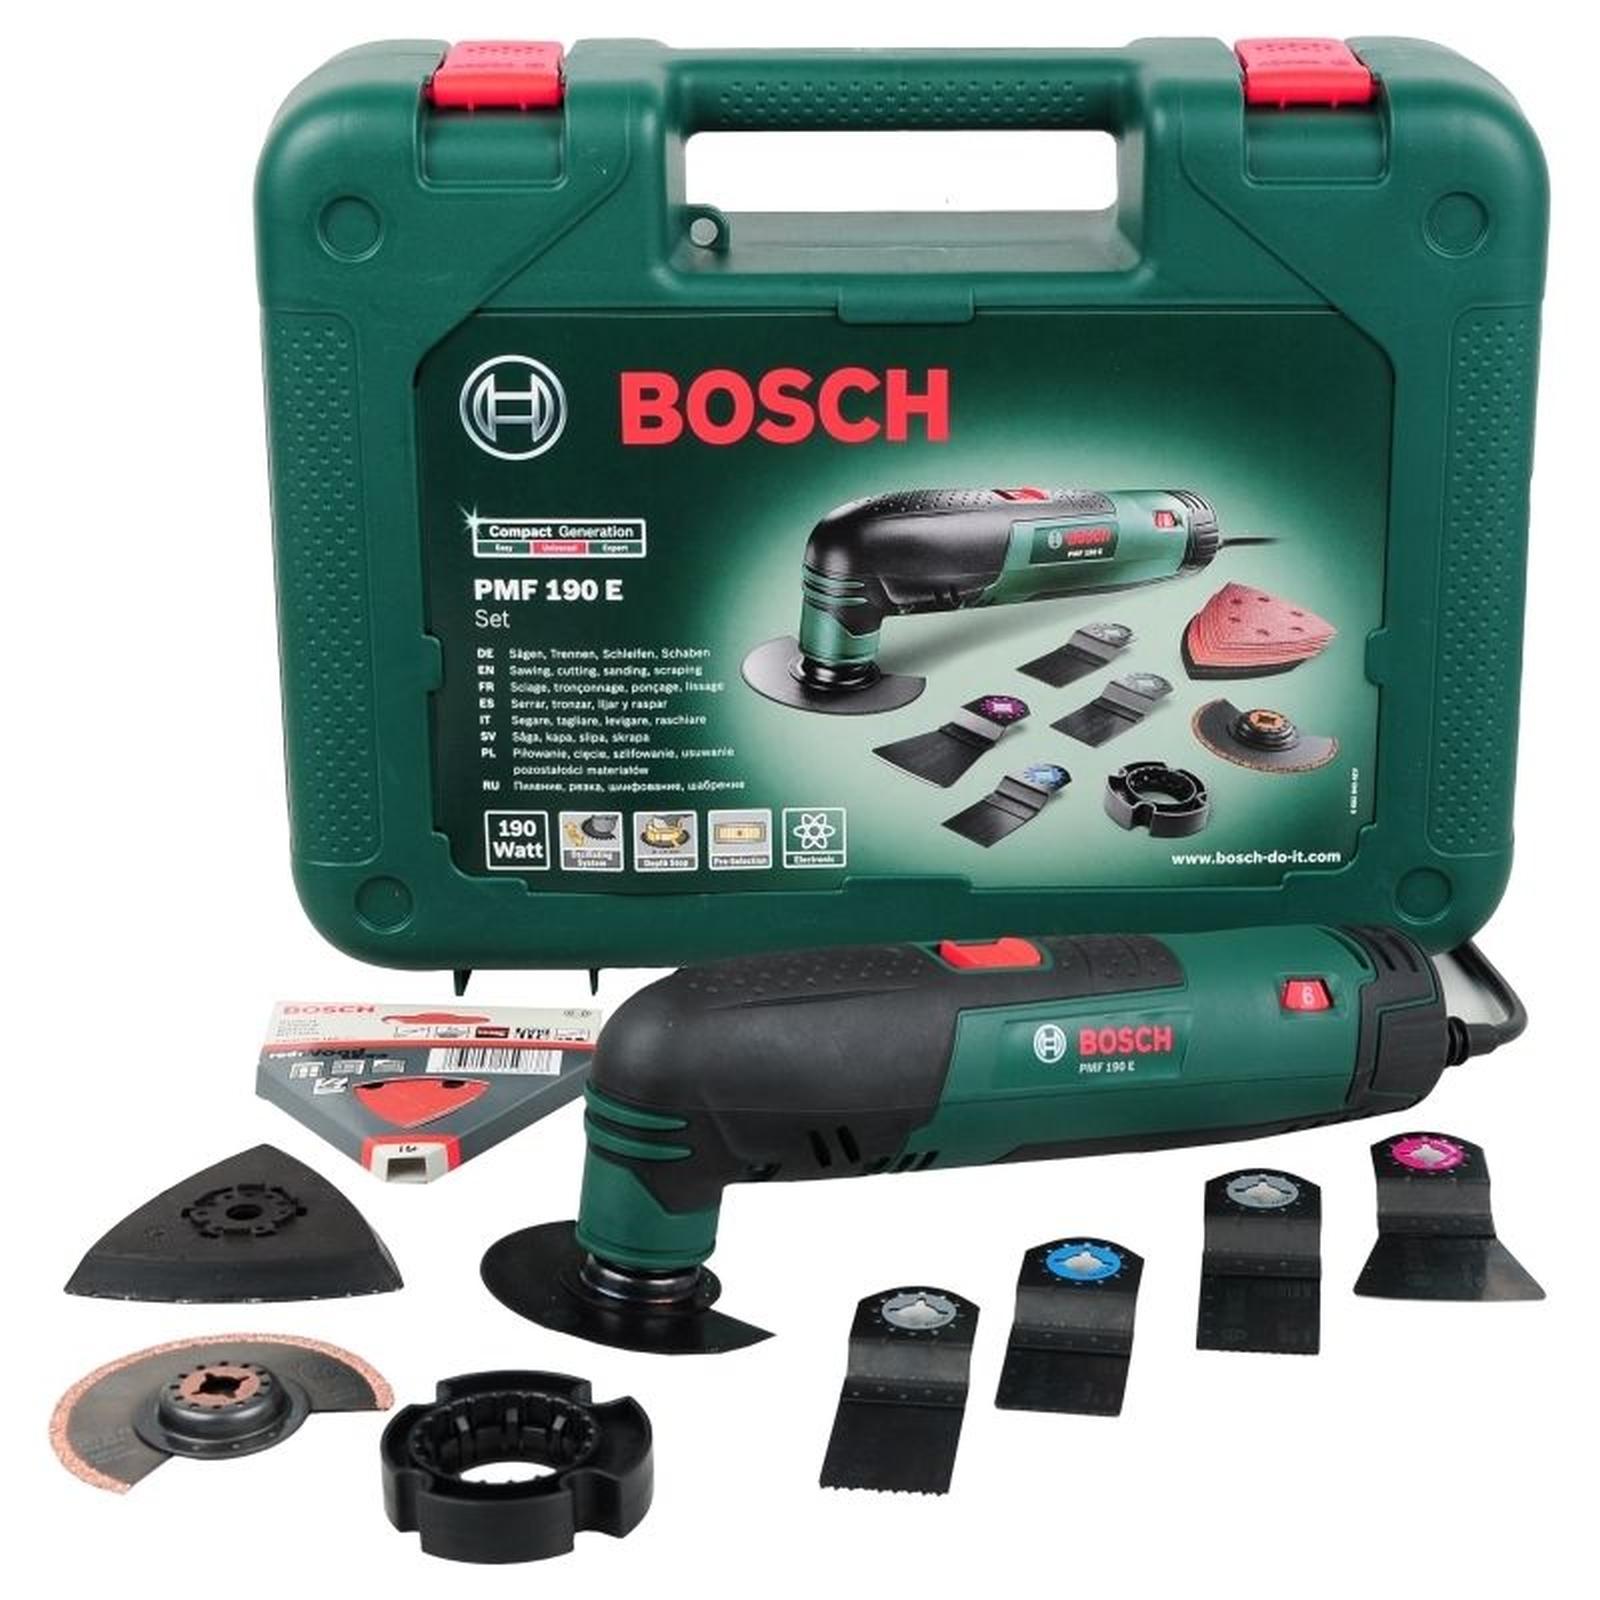 bosch multifunktionswerkzeug pmf 190 e set incl zubeh r koffer 0603100501 ebay. Black Bedroom Furniture Sets. Home Design Ideas